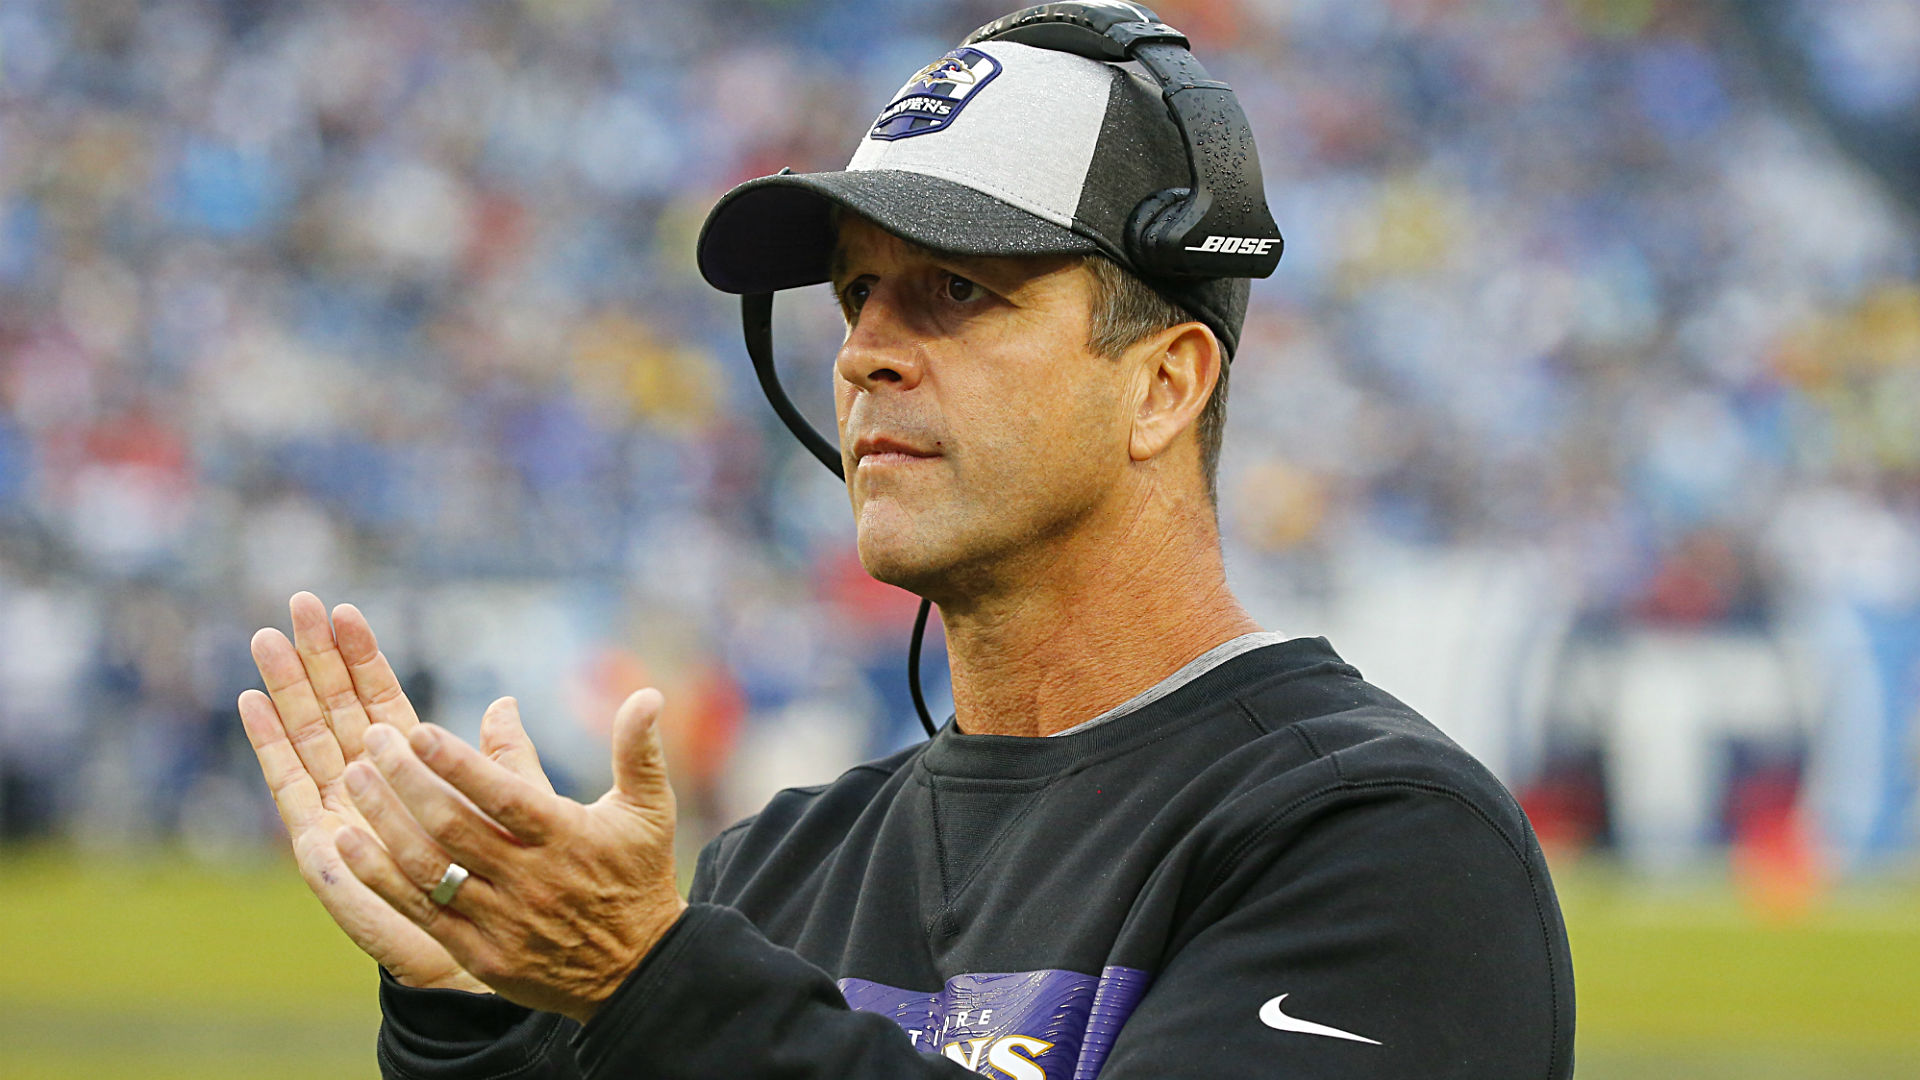 Andy Reid's coaching tree: Sean McDermott, John Harbaugh lead list of NFL success stories 2